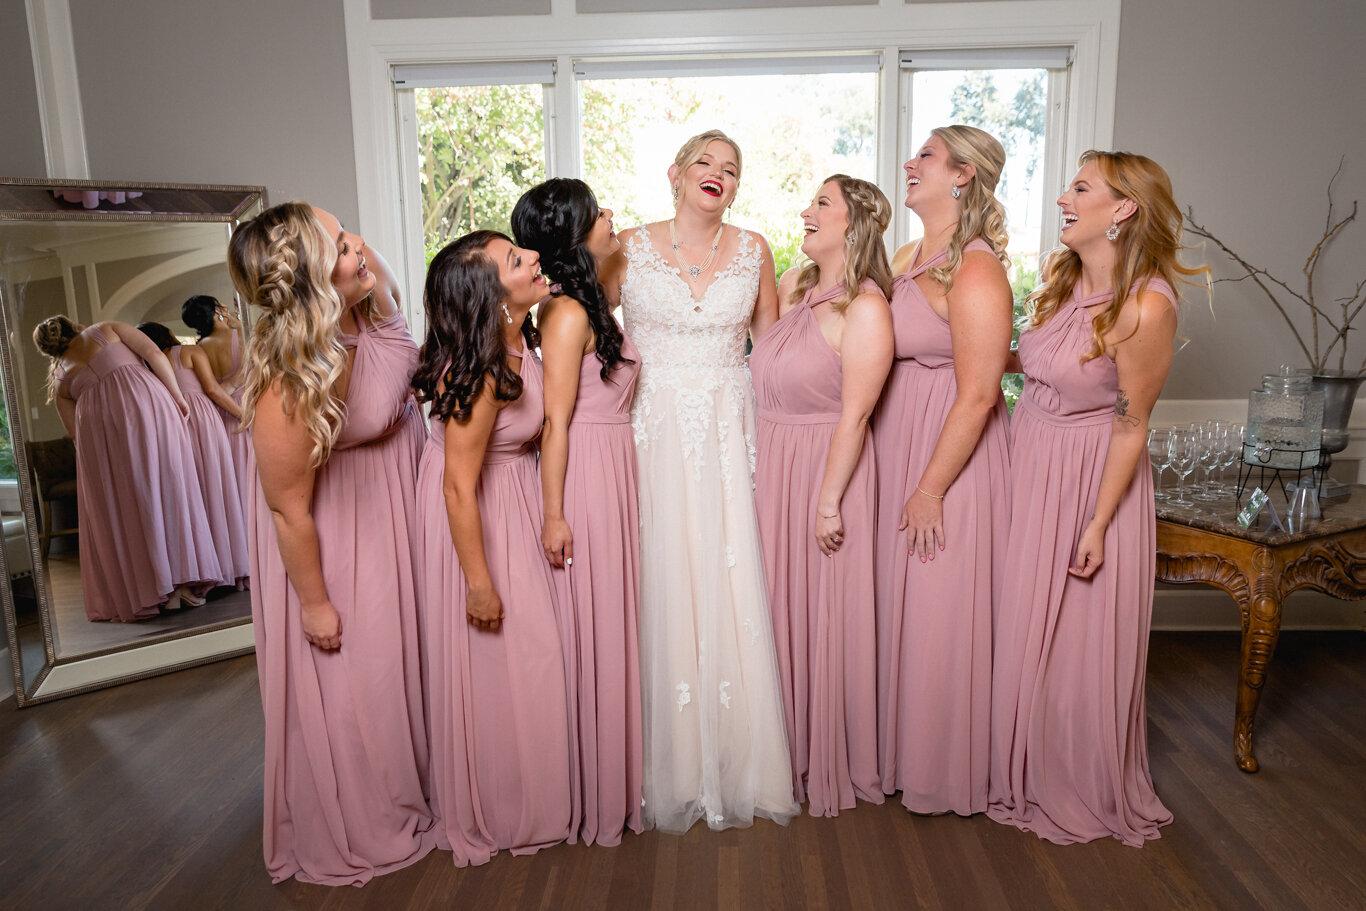 2019.08.24_Emily-Ashir-Wedding-at-the-Maples-5198.jpg